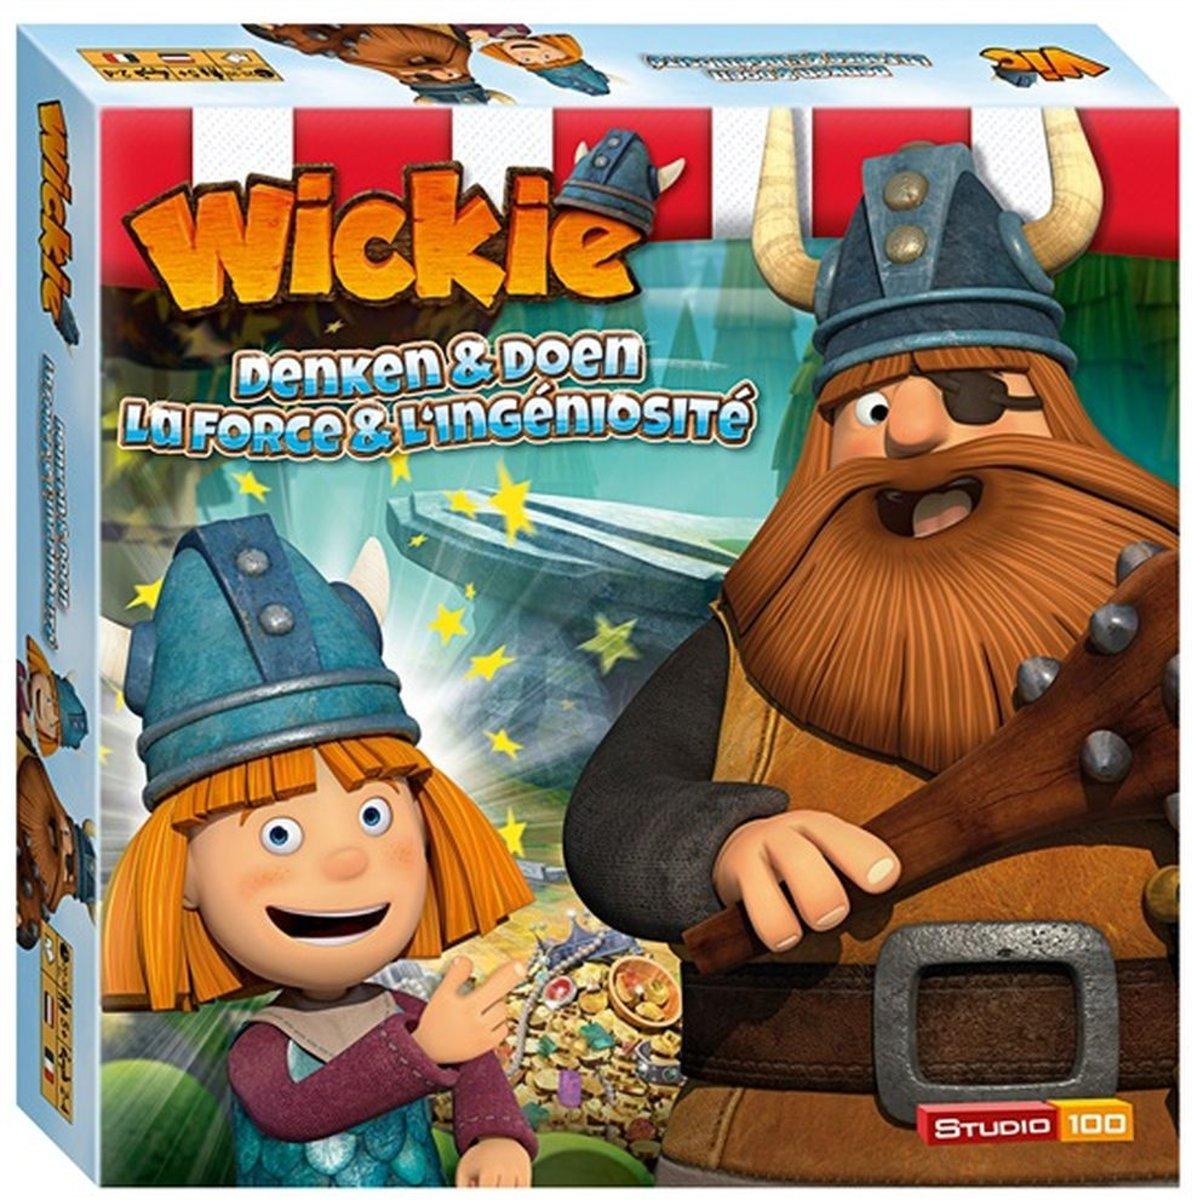 Wickie de Viking Spel Denken Of Doe - Kinderspel